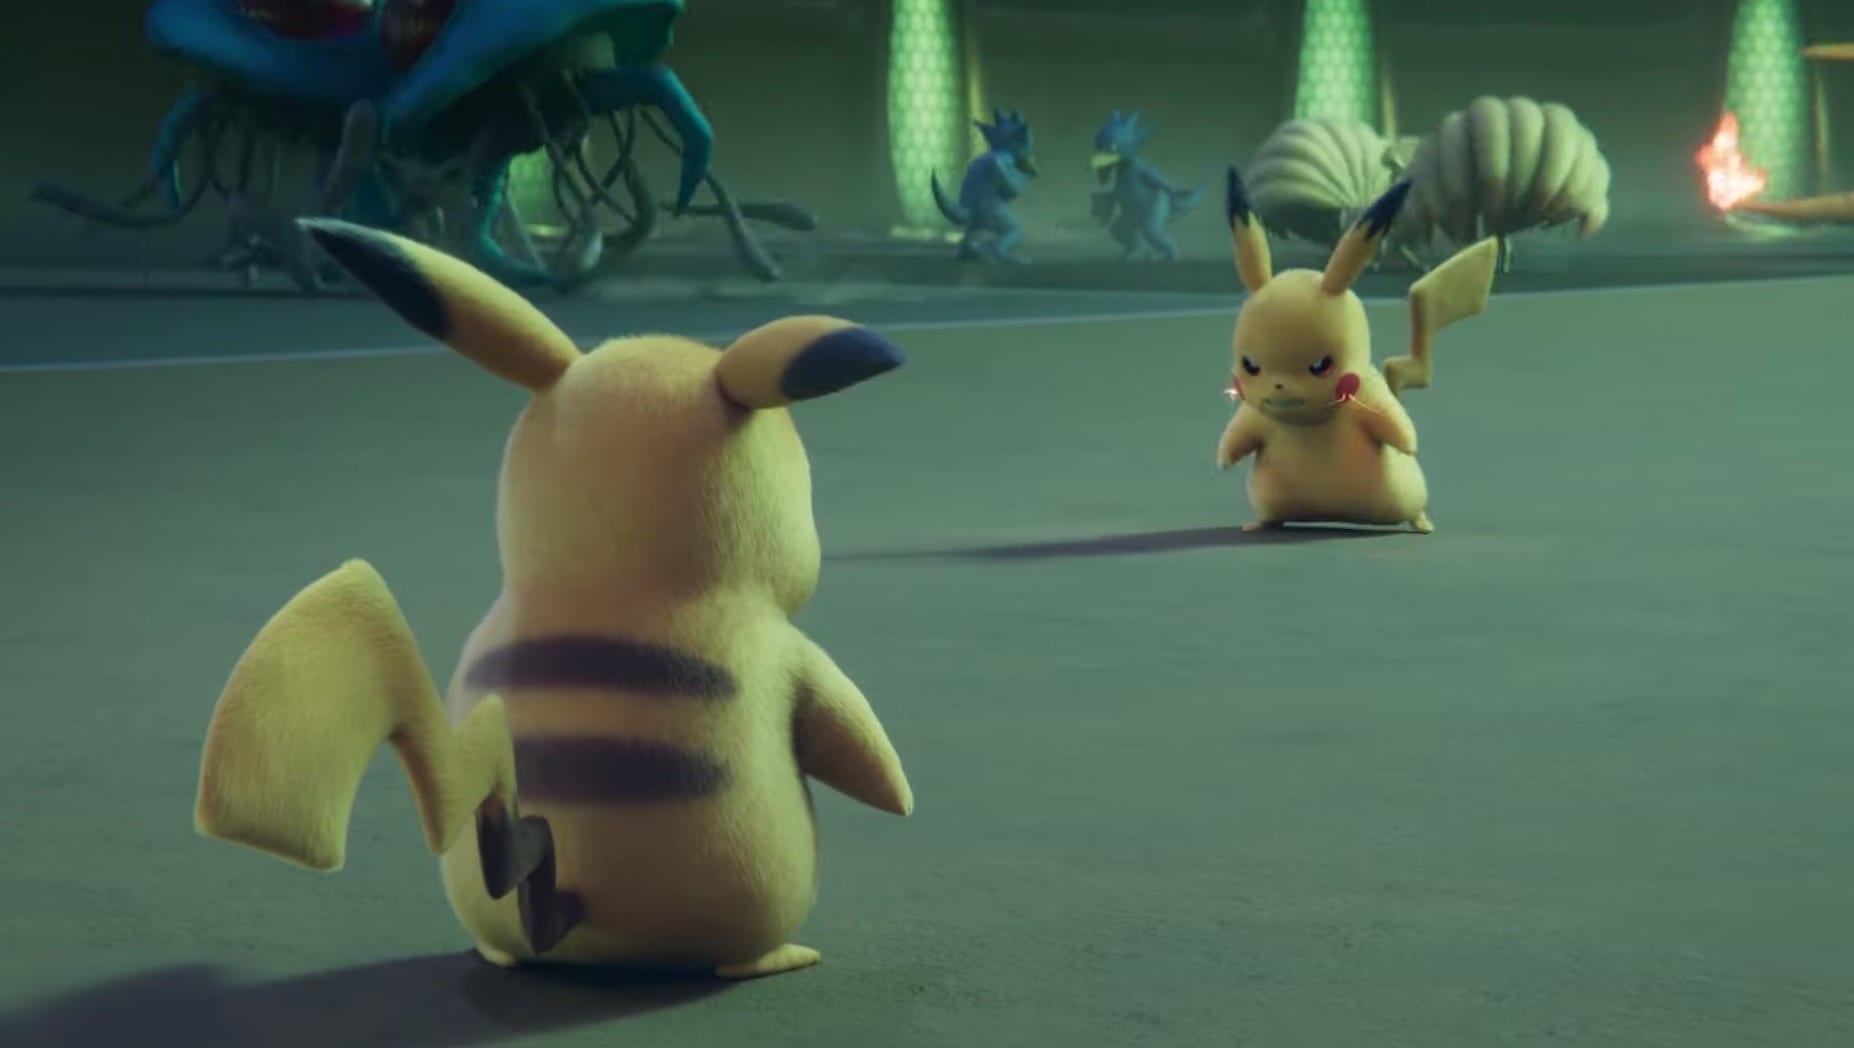 Pokémon - Fighting